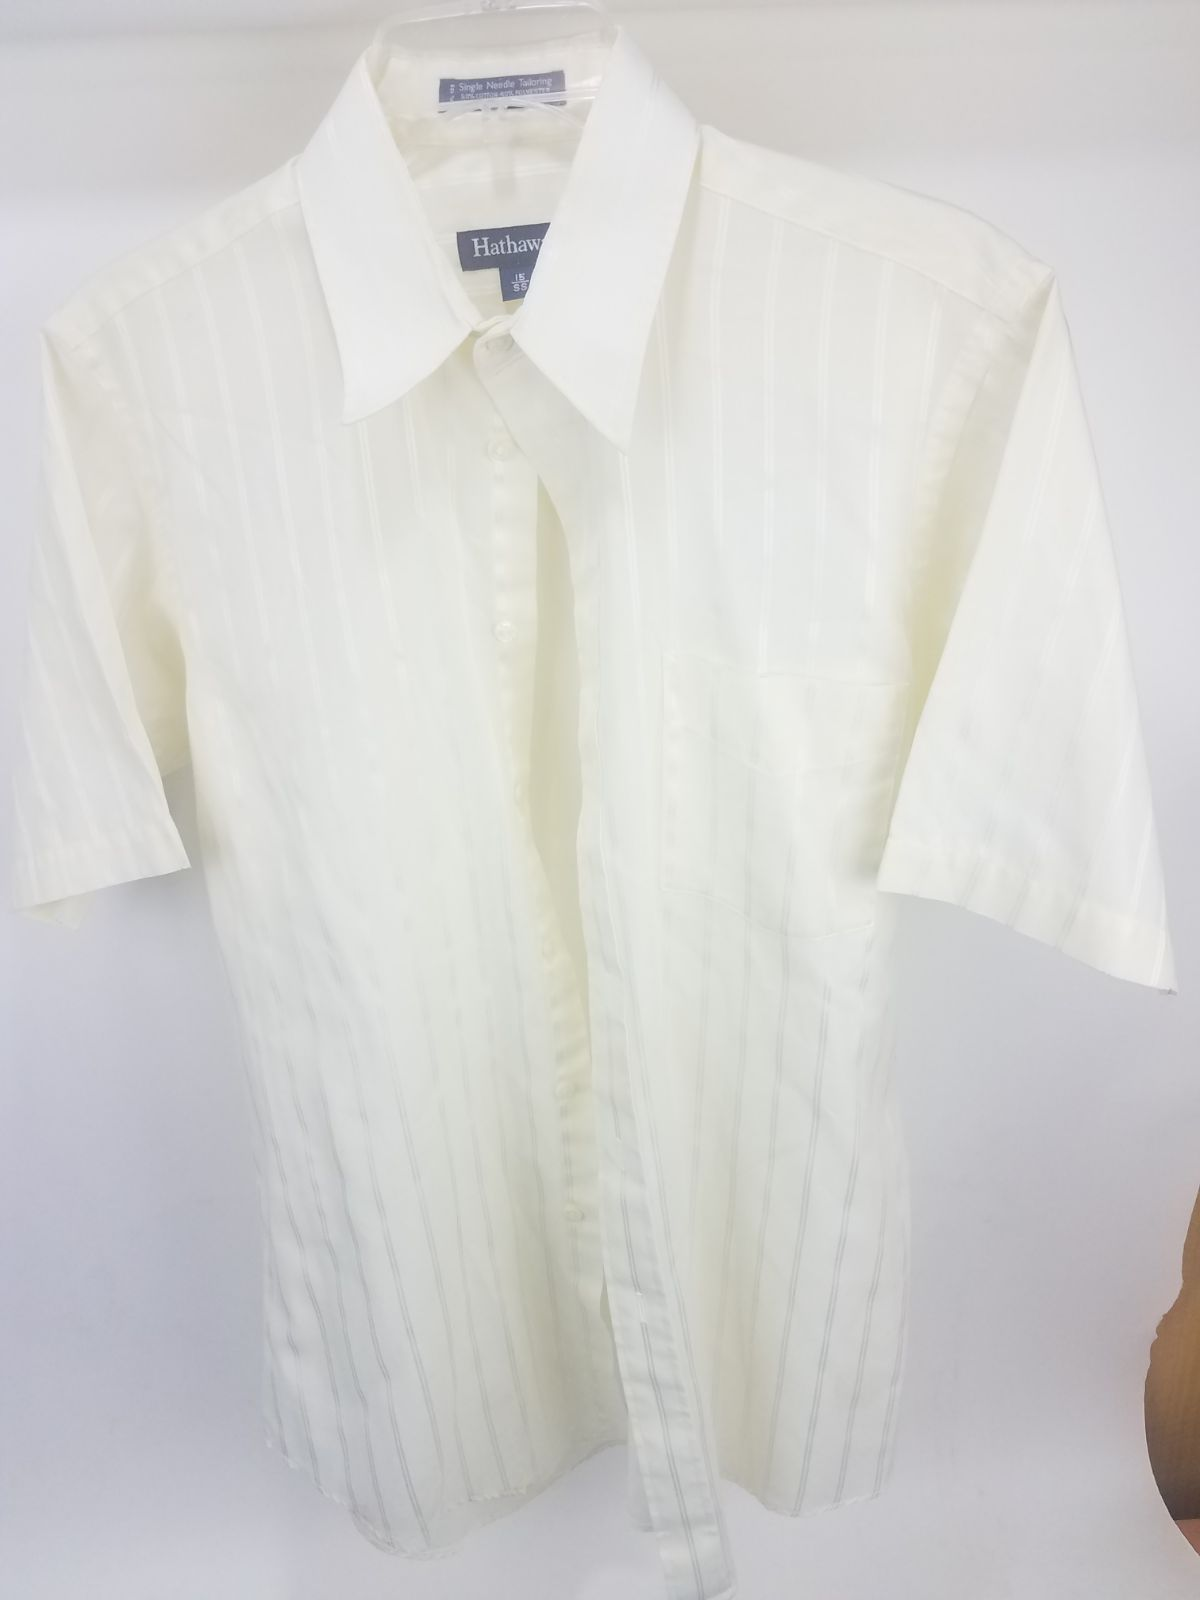 Hathaway Button Down shirt